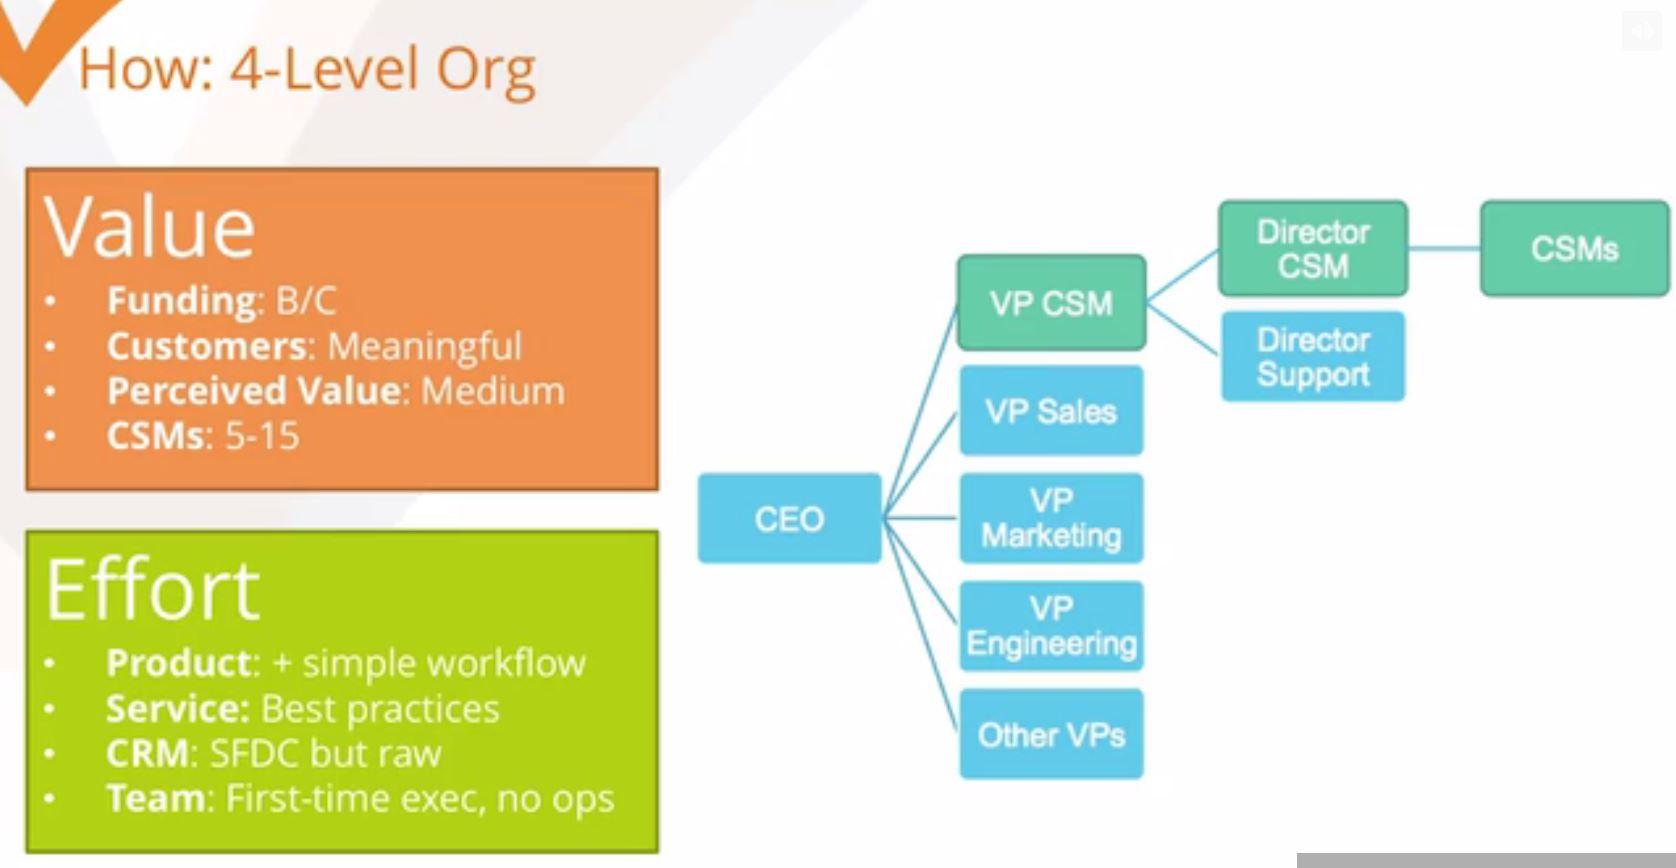 Example of segmentation aligning with company maturity